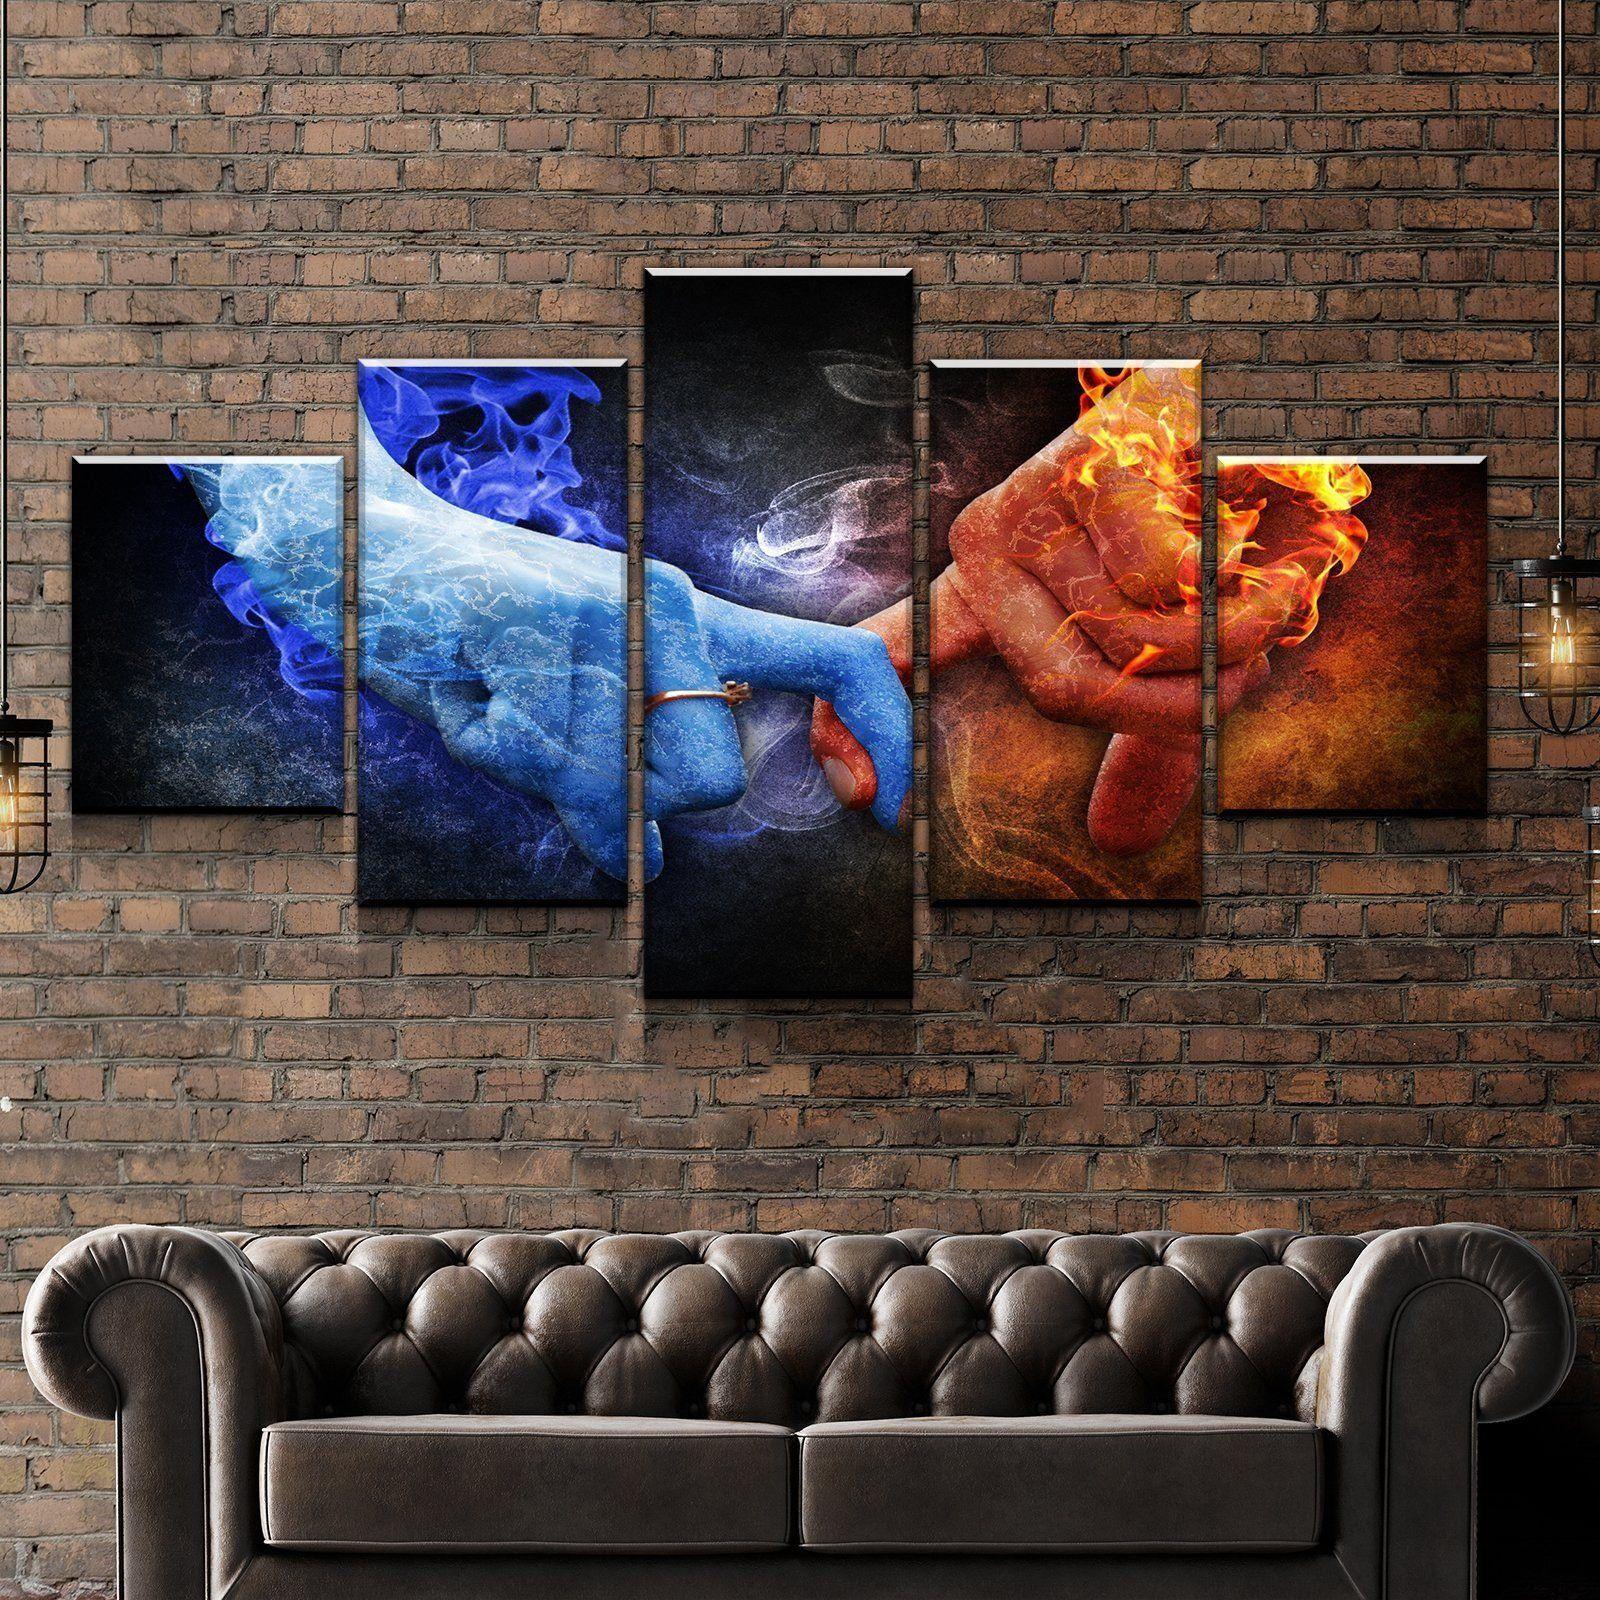 Love Balance Canvas Set Wall Art Man Cave Gallery Wrap Etsy Man Cave Wall Art Canvas Set Multi Panel Paintings